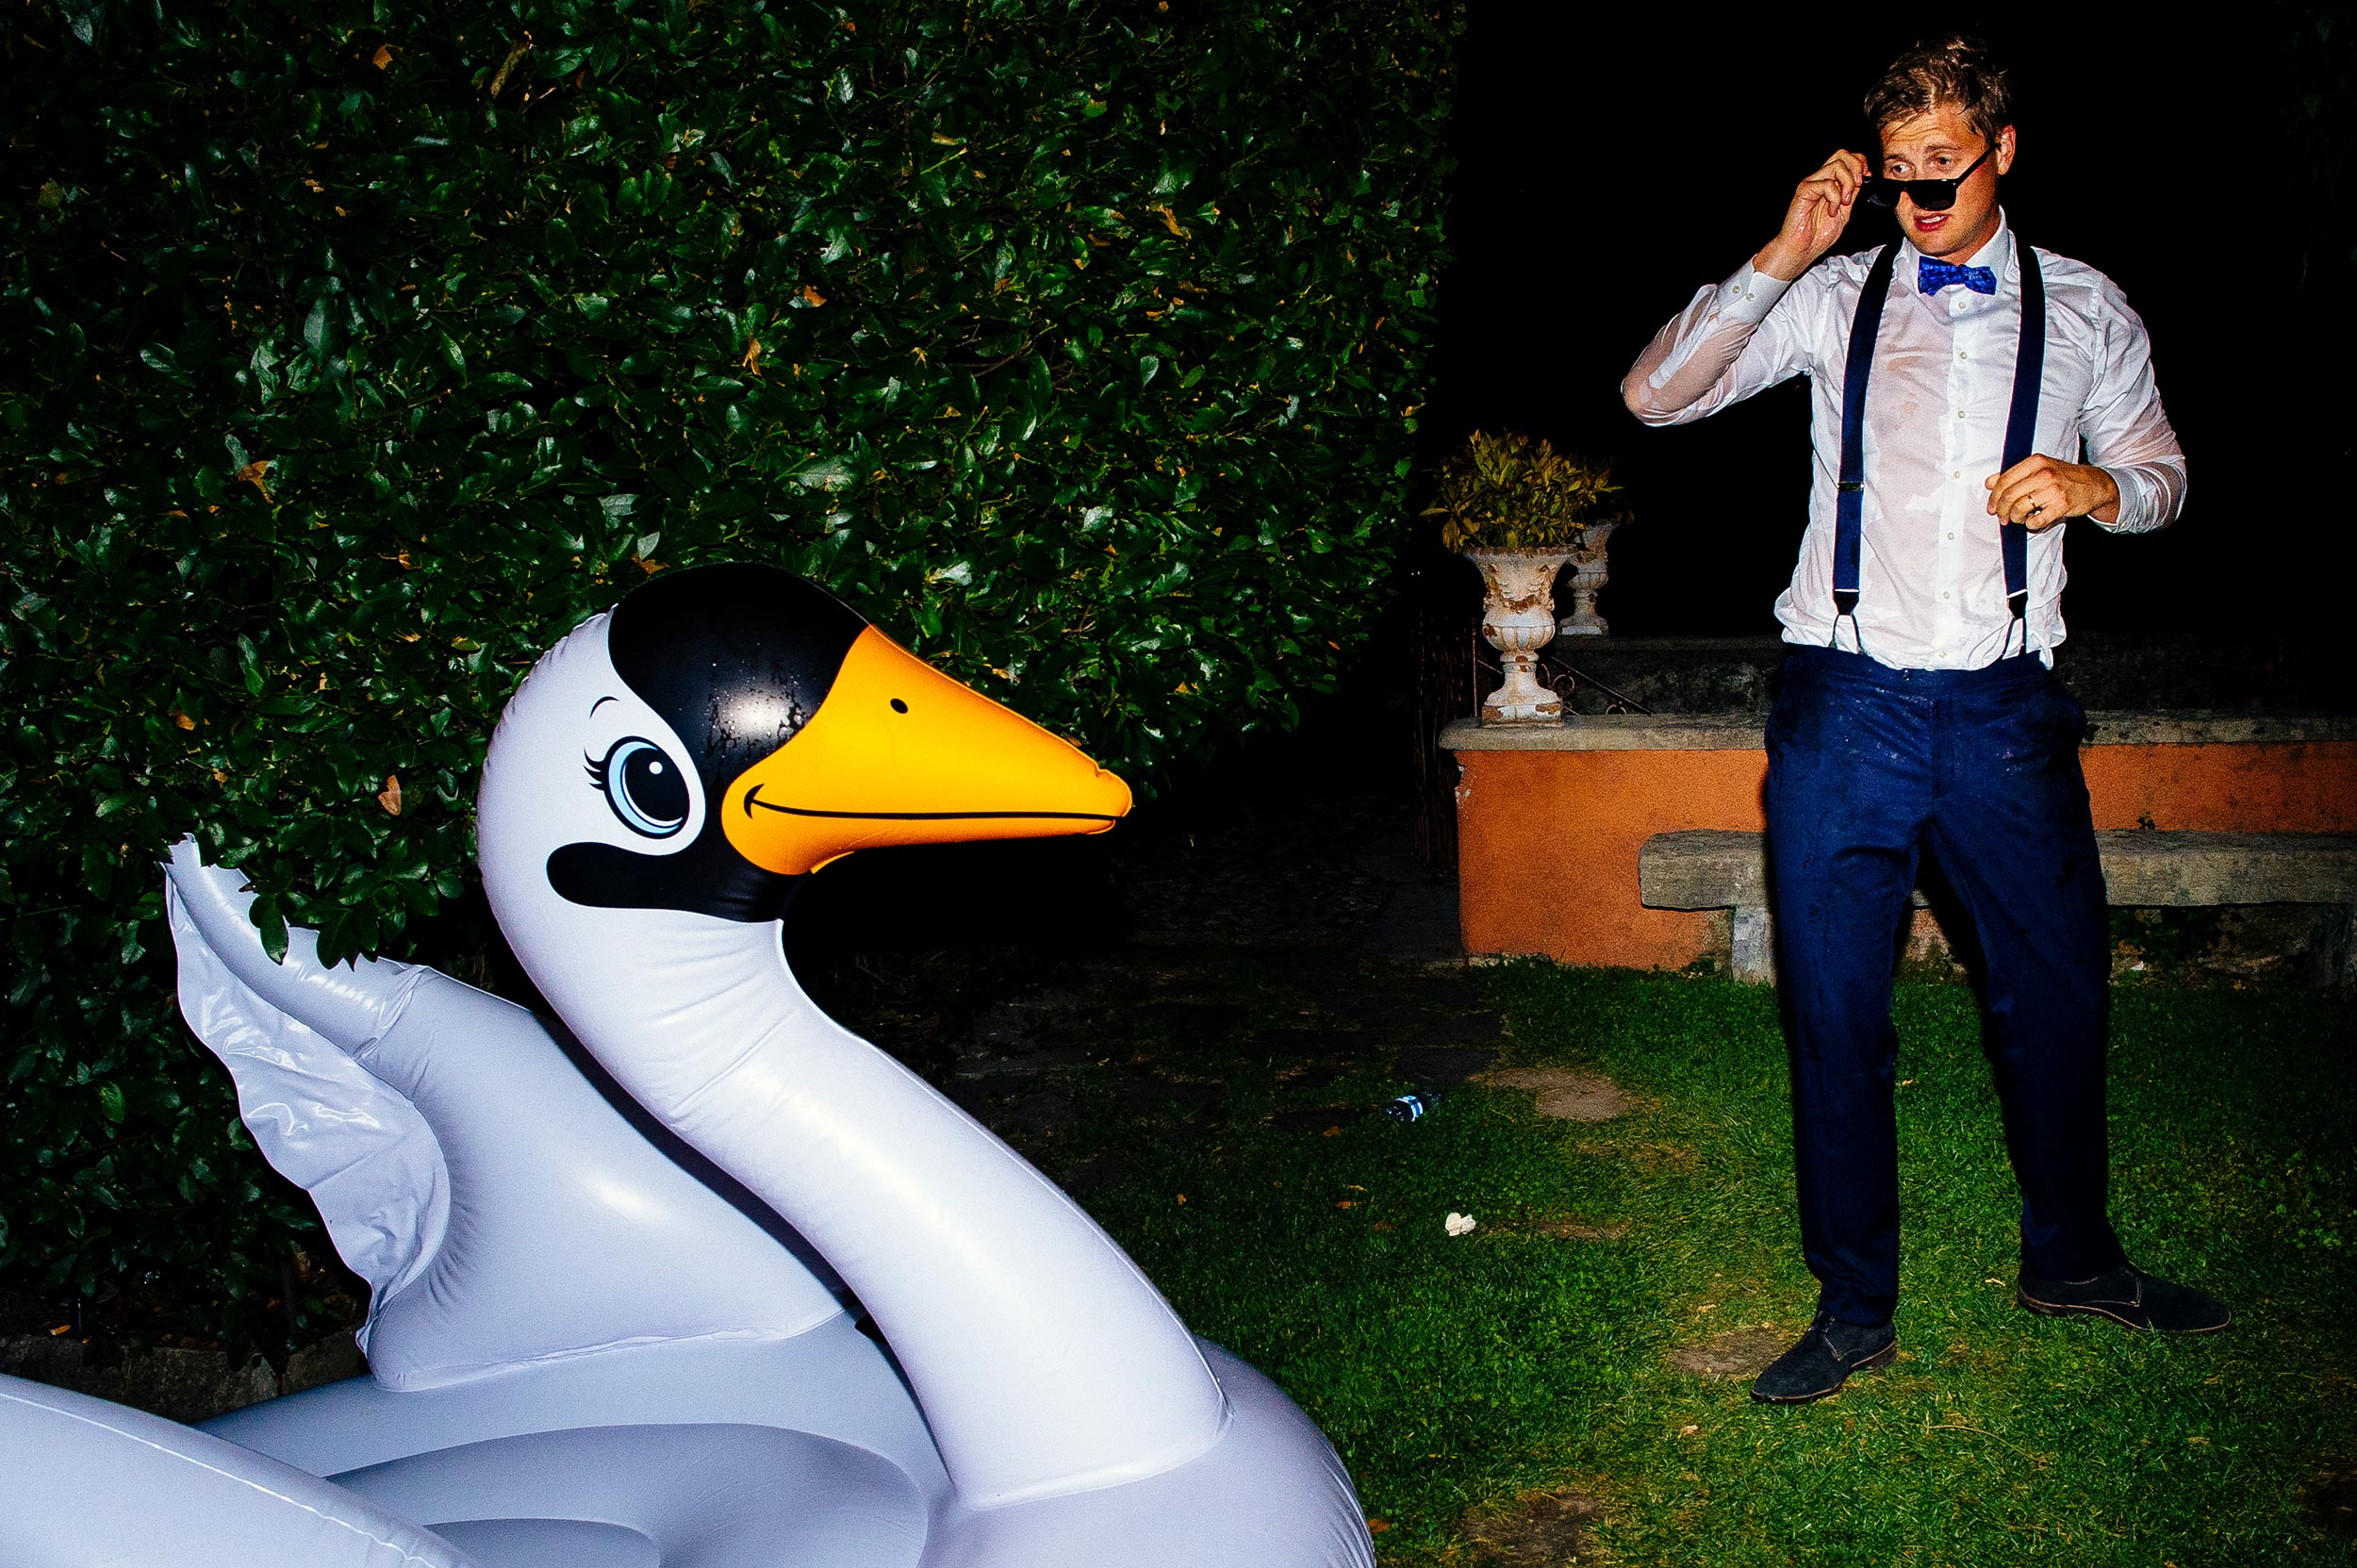 2018-Villa-Regina-Teodolinda-Lake-Como-Wedding-Photographer-Italy-Alessandro-Avenali-364.jpg